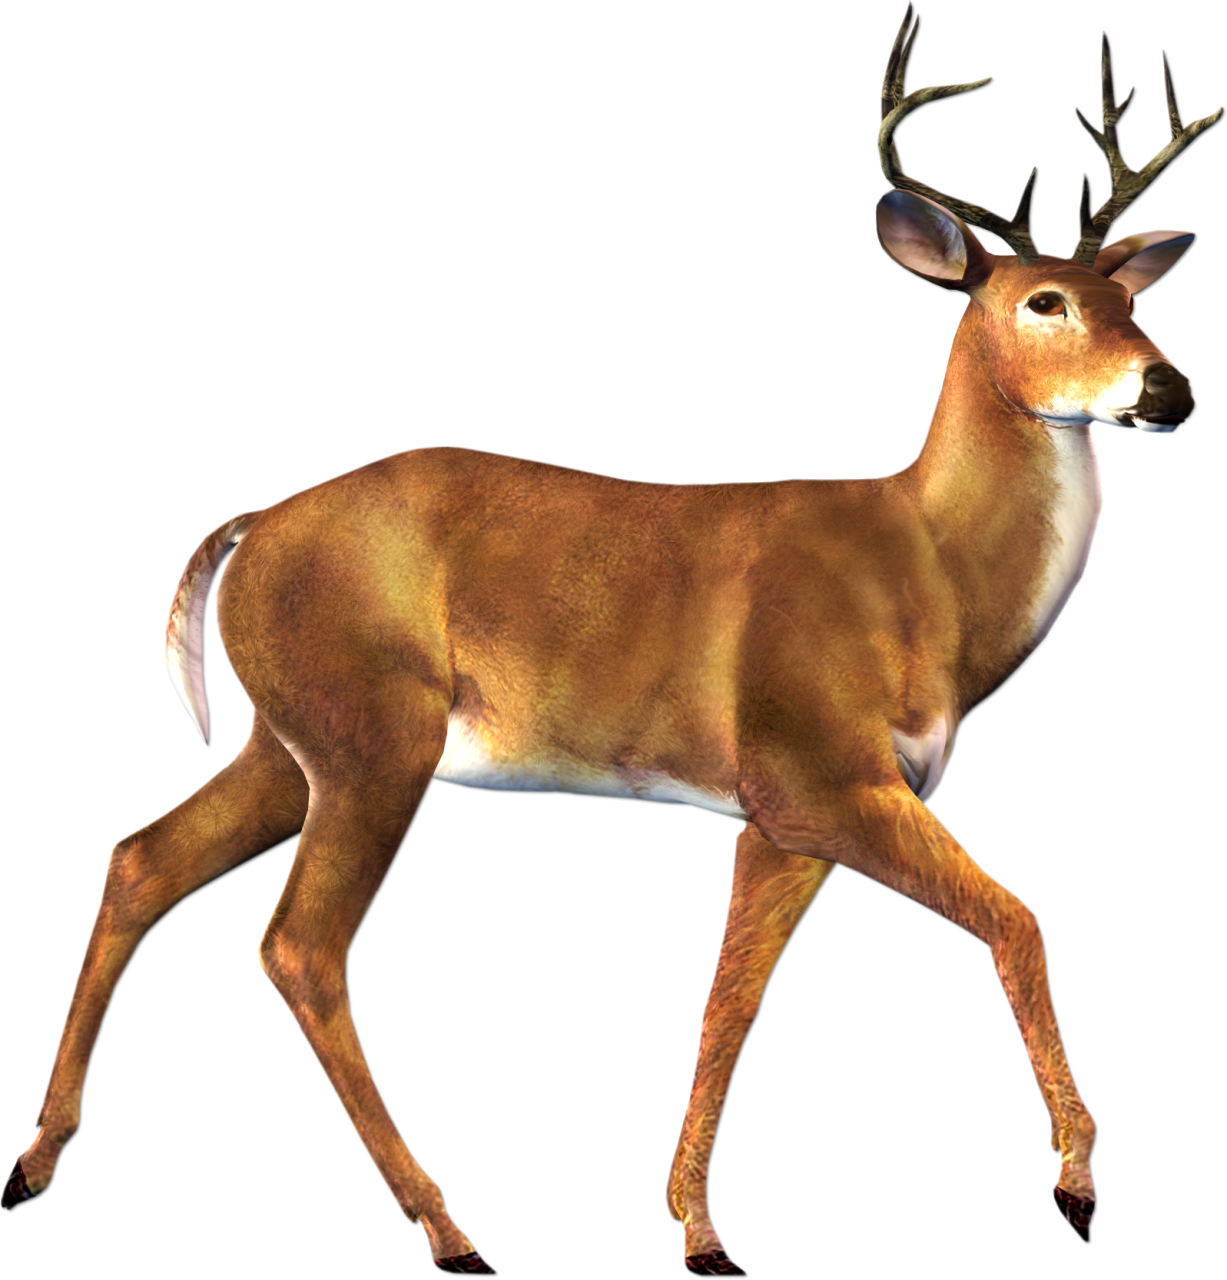 Deer buck clipart free clip art images image 0